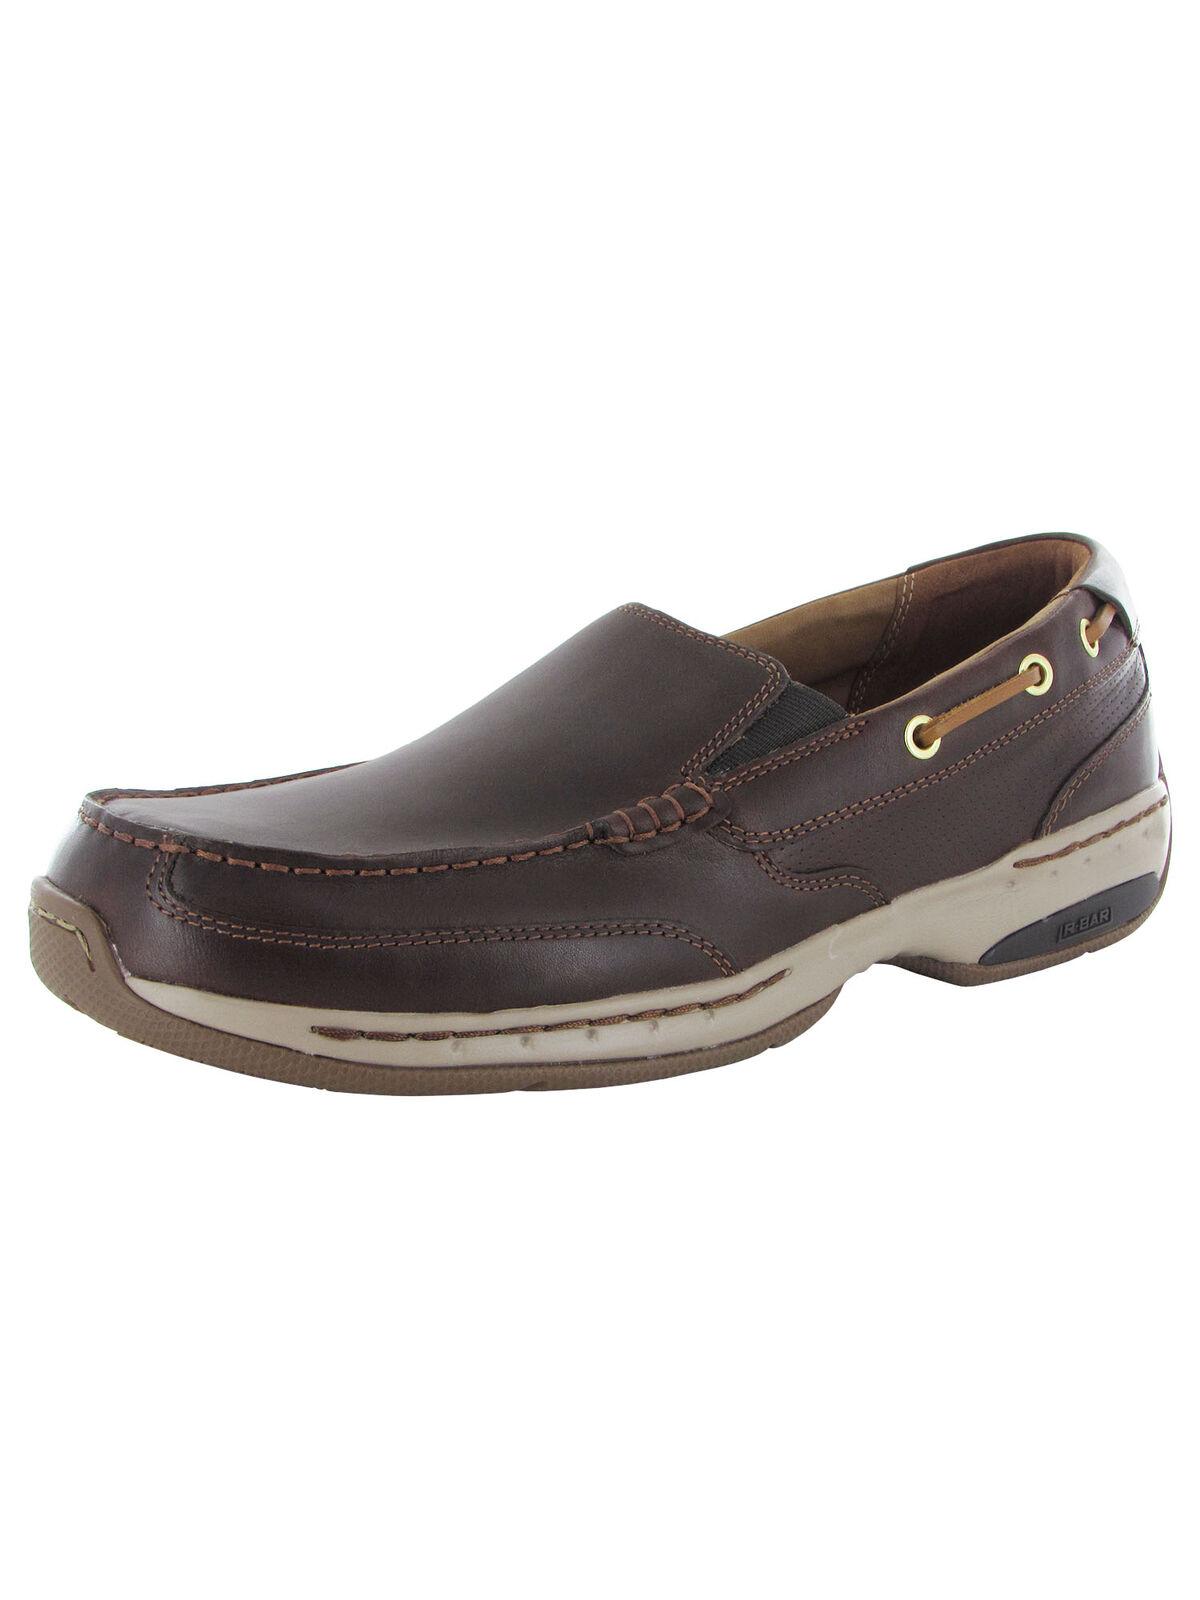 Dunham Herren Waterford Slipper Leder Stiefel Schuhe